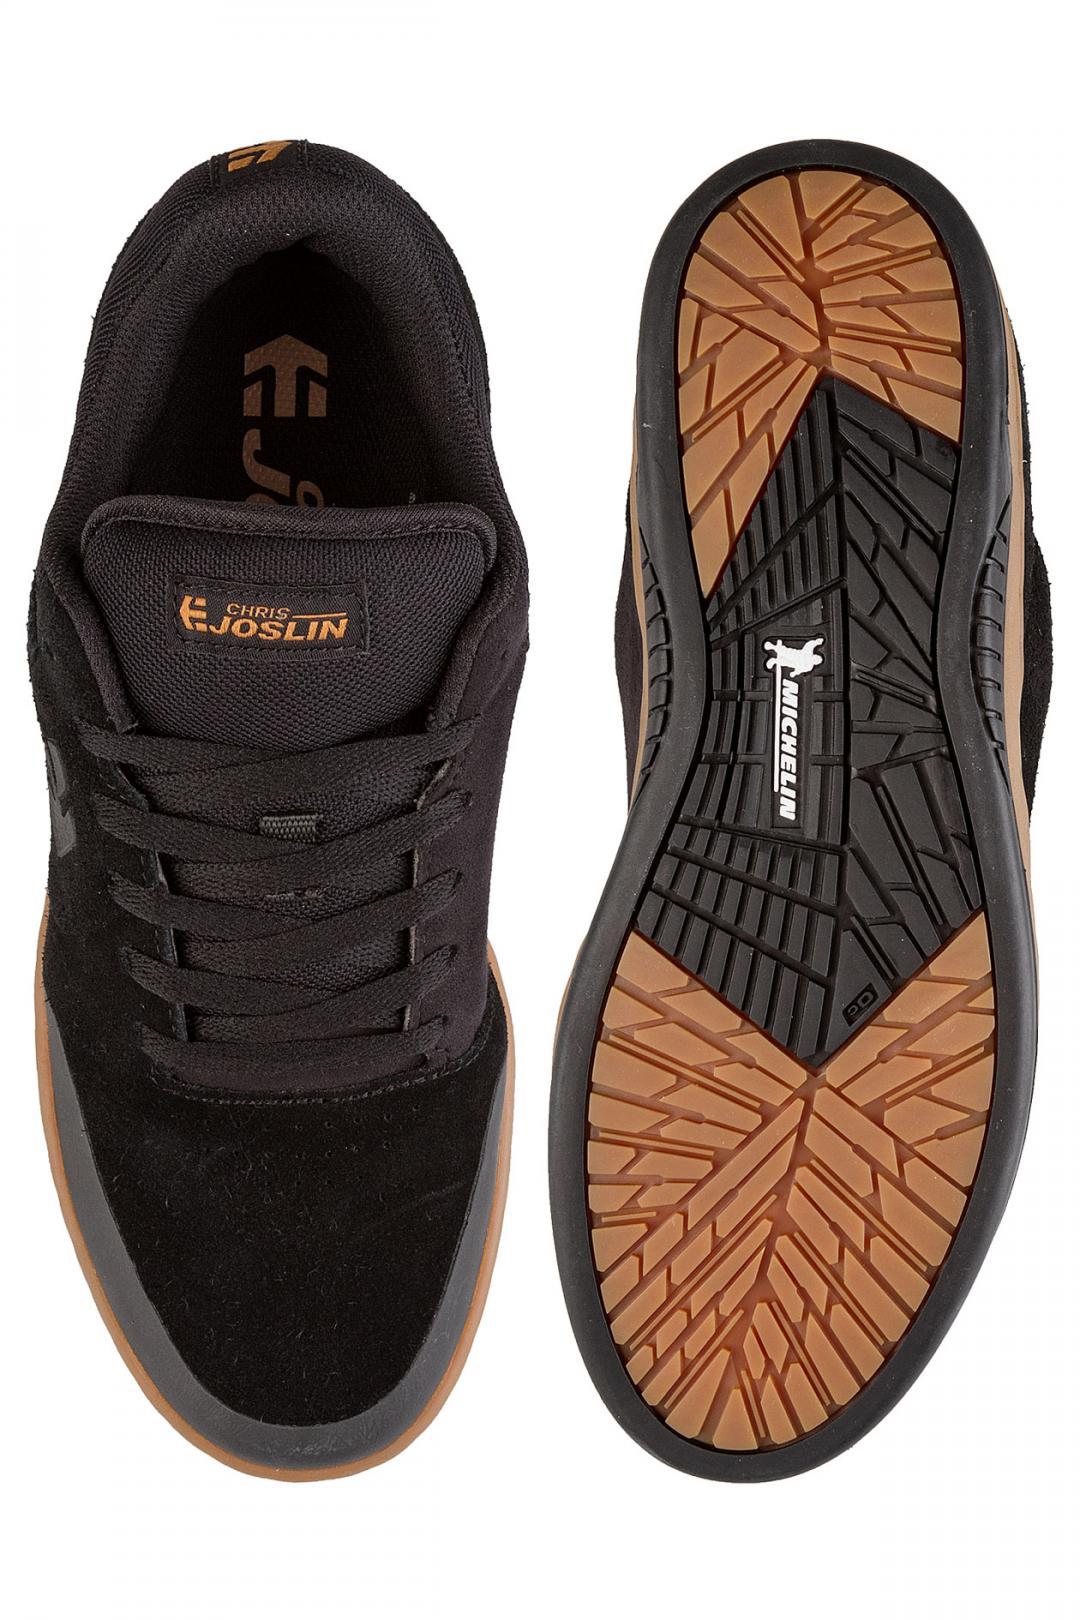 Uomo Etnies Marana x Michelin black red gum   Sneakers low top